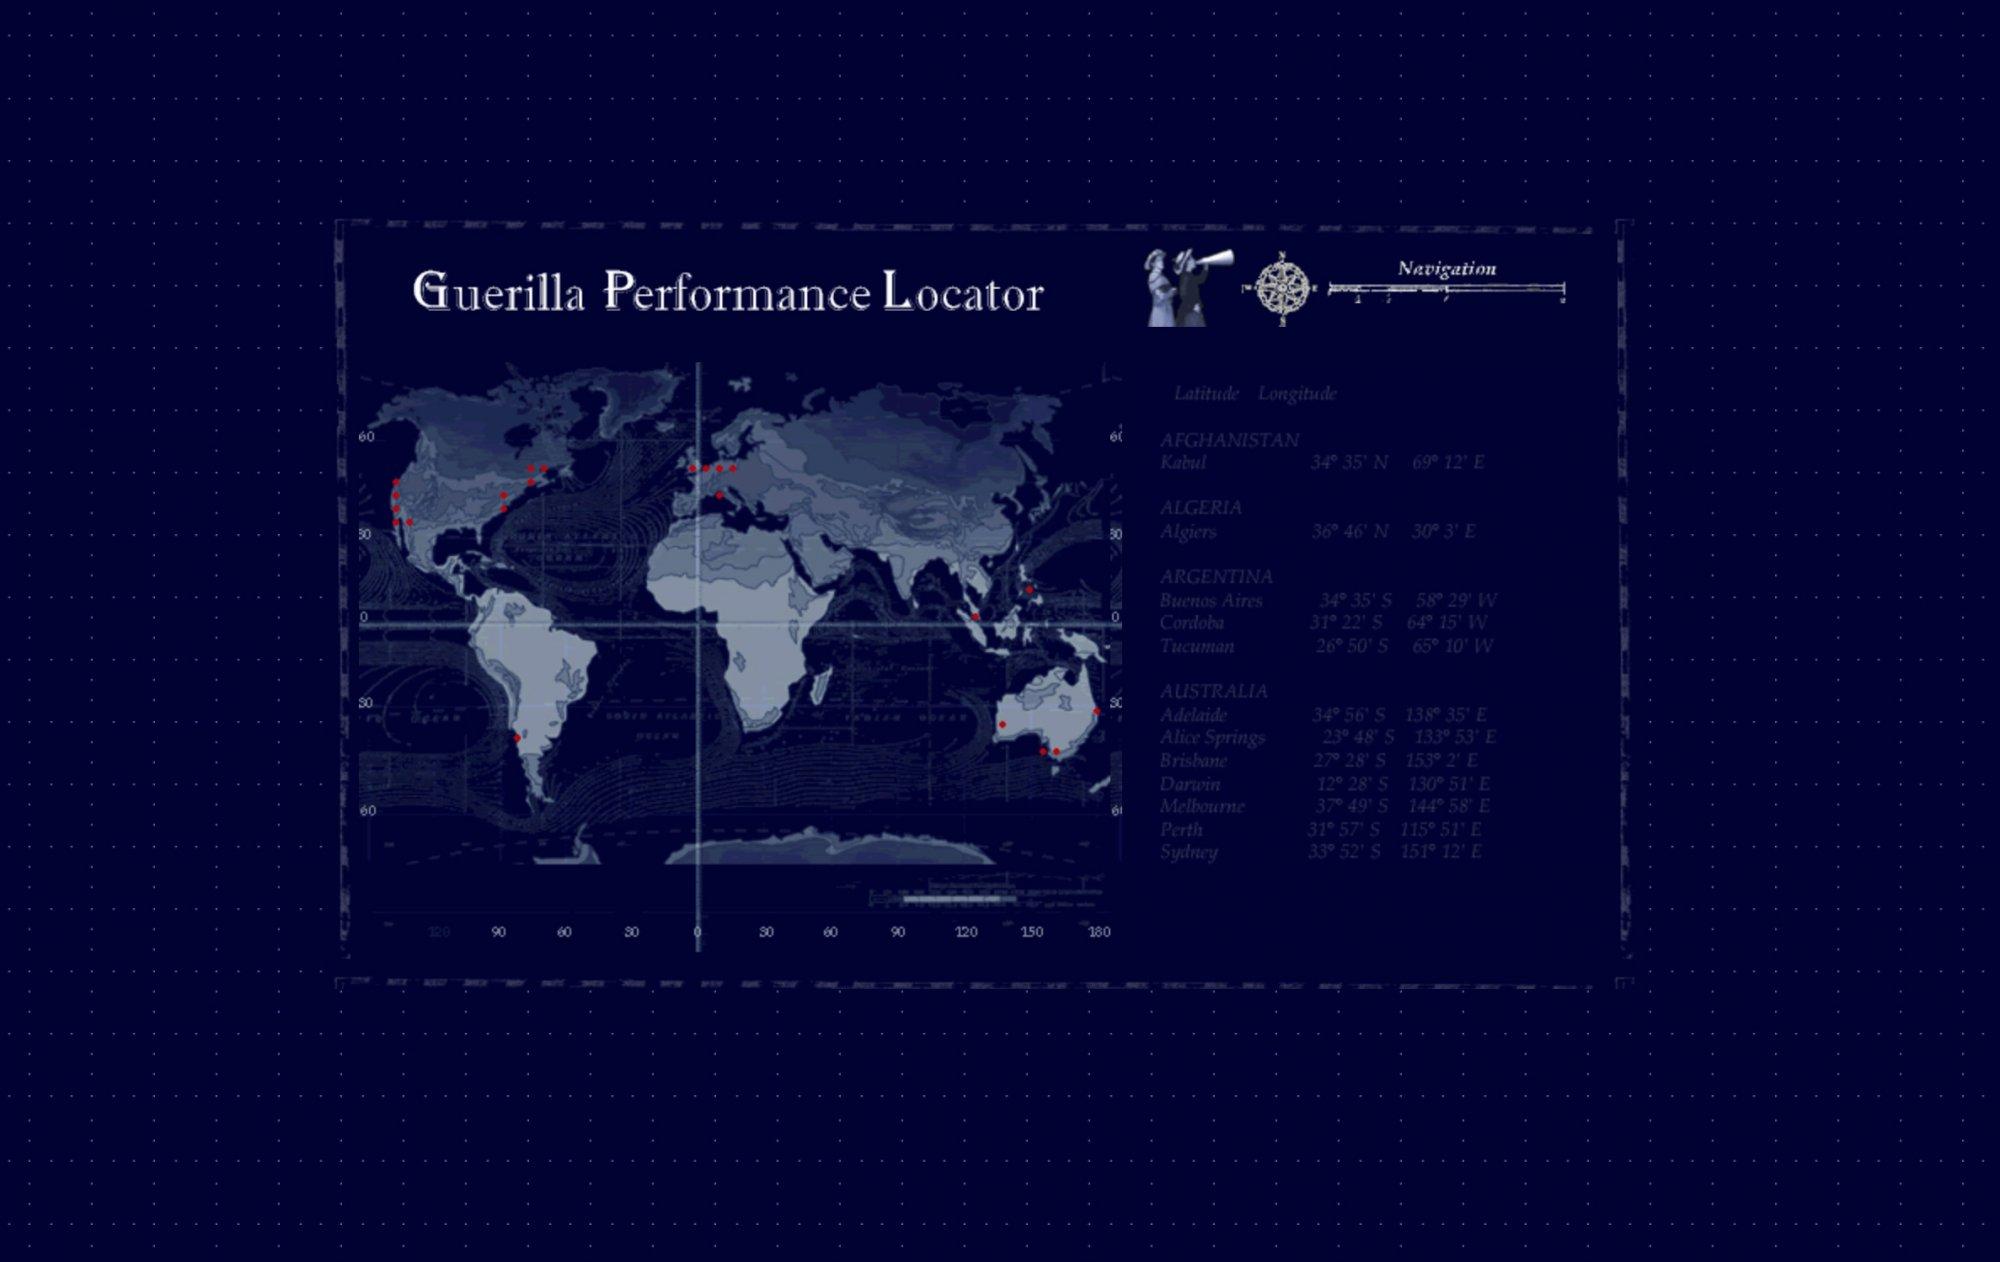 Guerilla Performance Locator